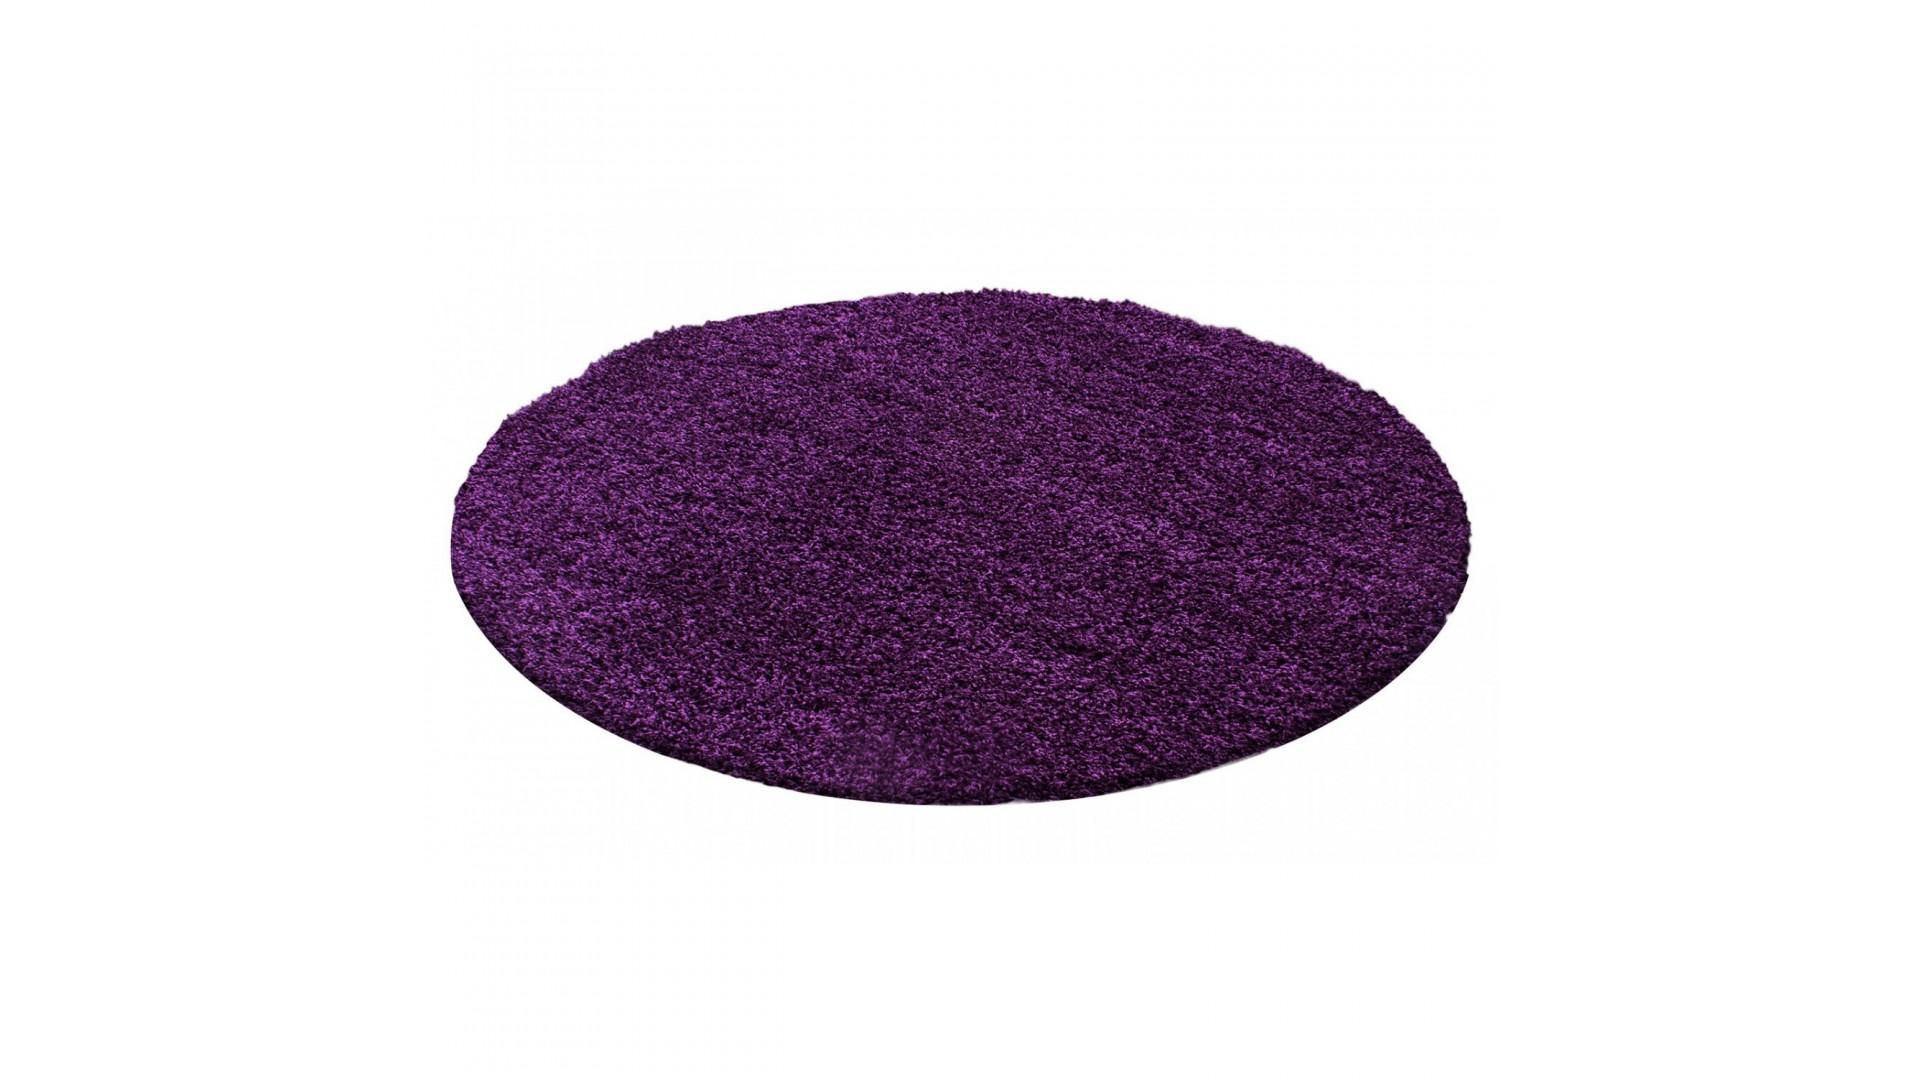 Purpurowe odcienie.